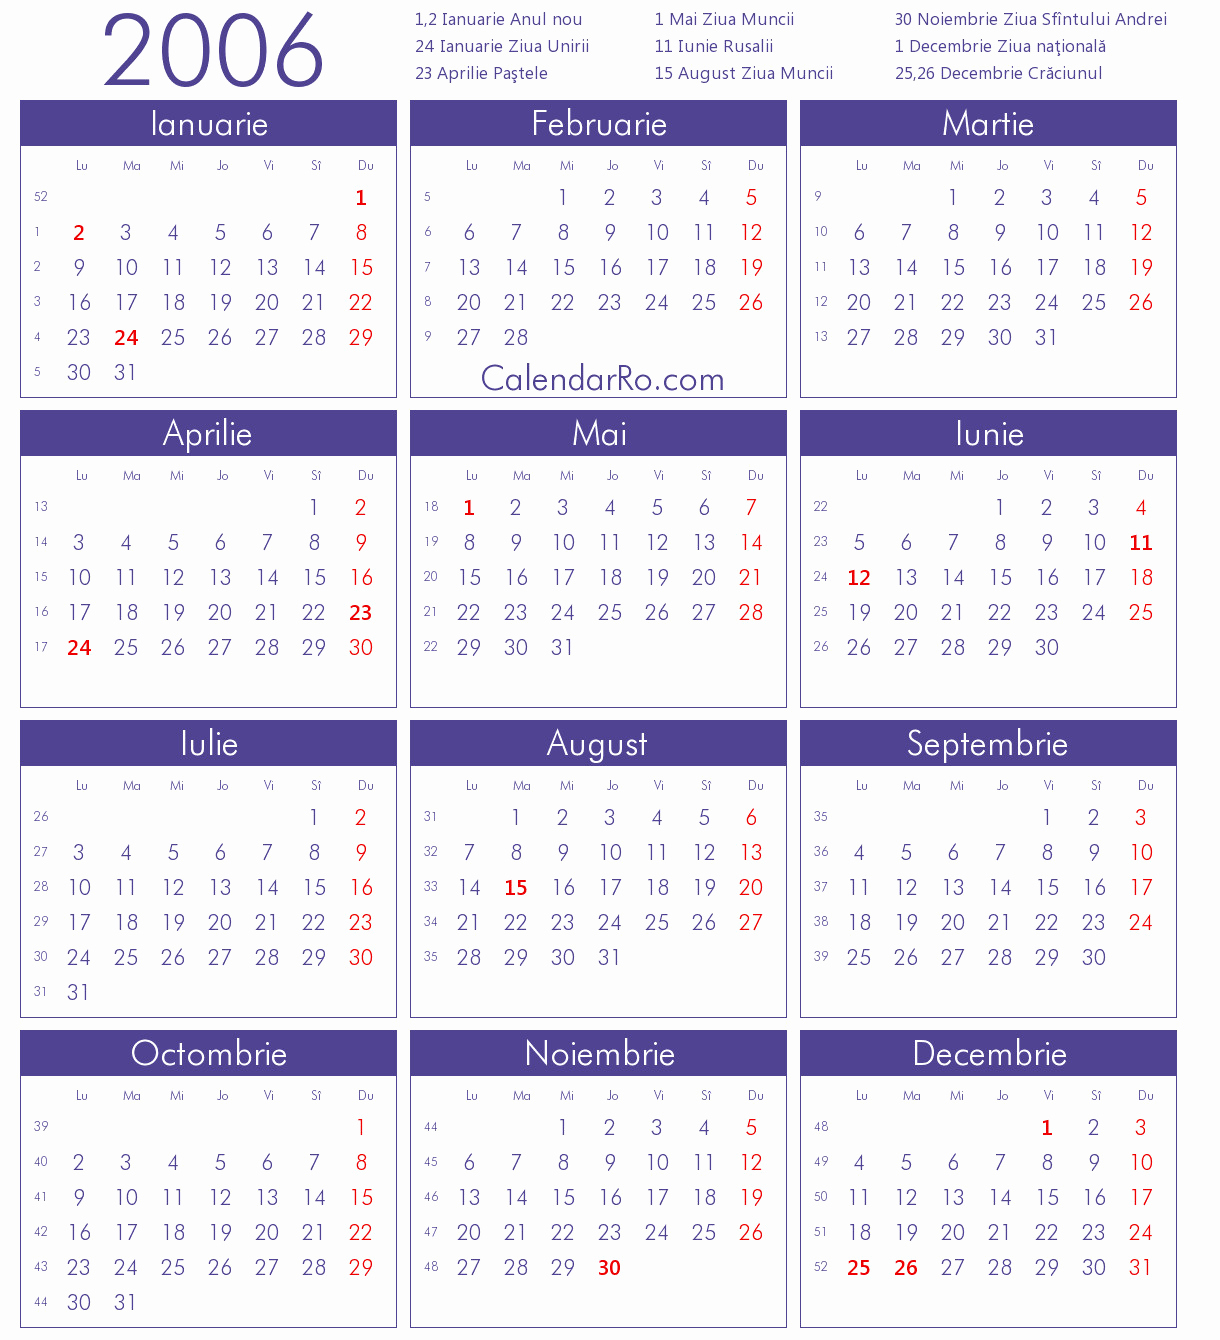 Payroll Calendar Template 2017 Beautiful Adp Payroll Calendar 2018 2017 Printable Template at